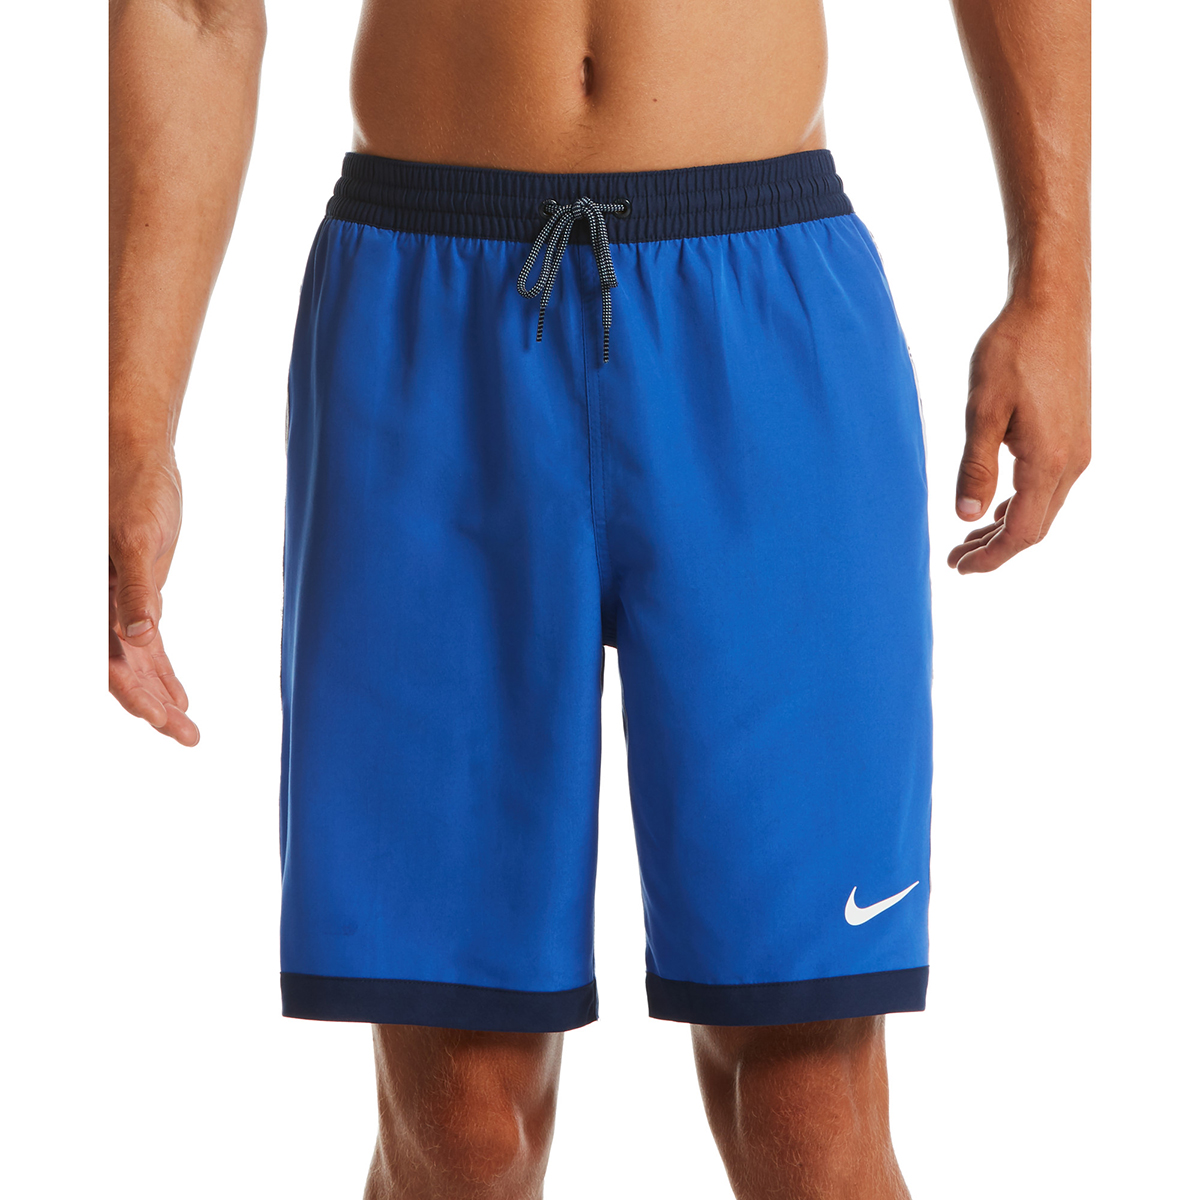 "Nike Men's Funfetti Racer 9"" Swim Trunks - Blue, M"